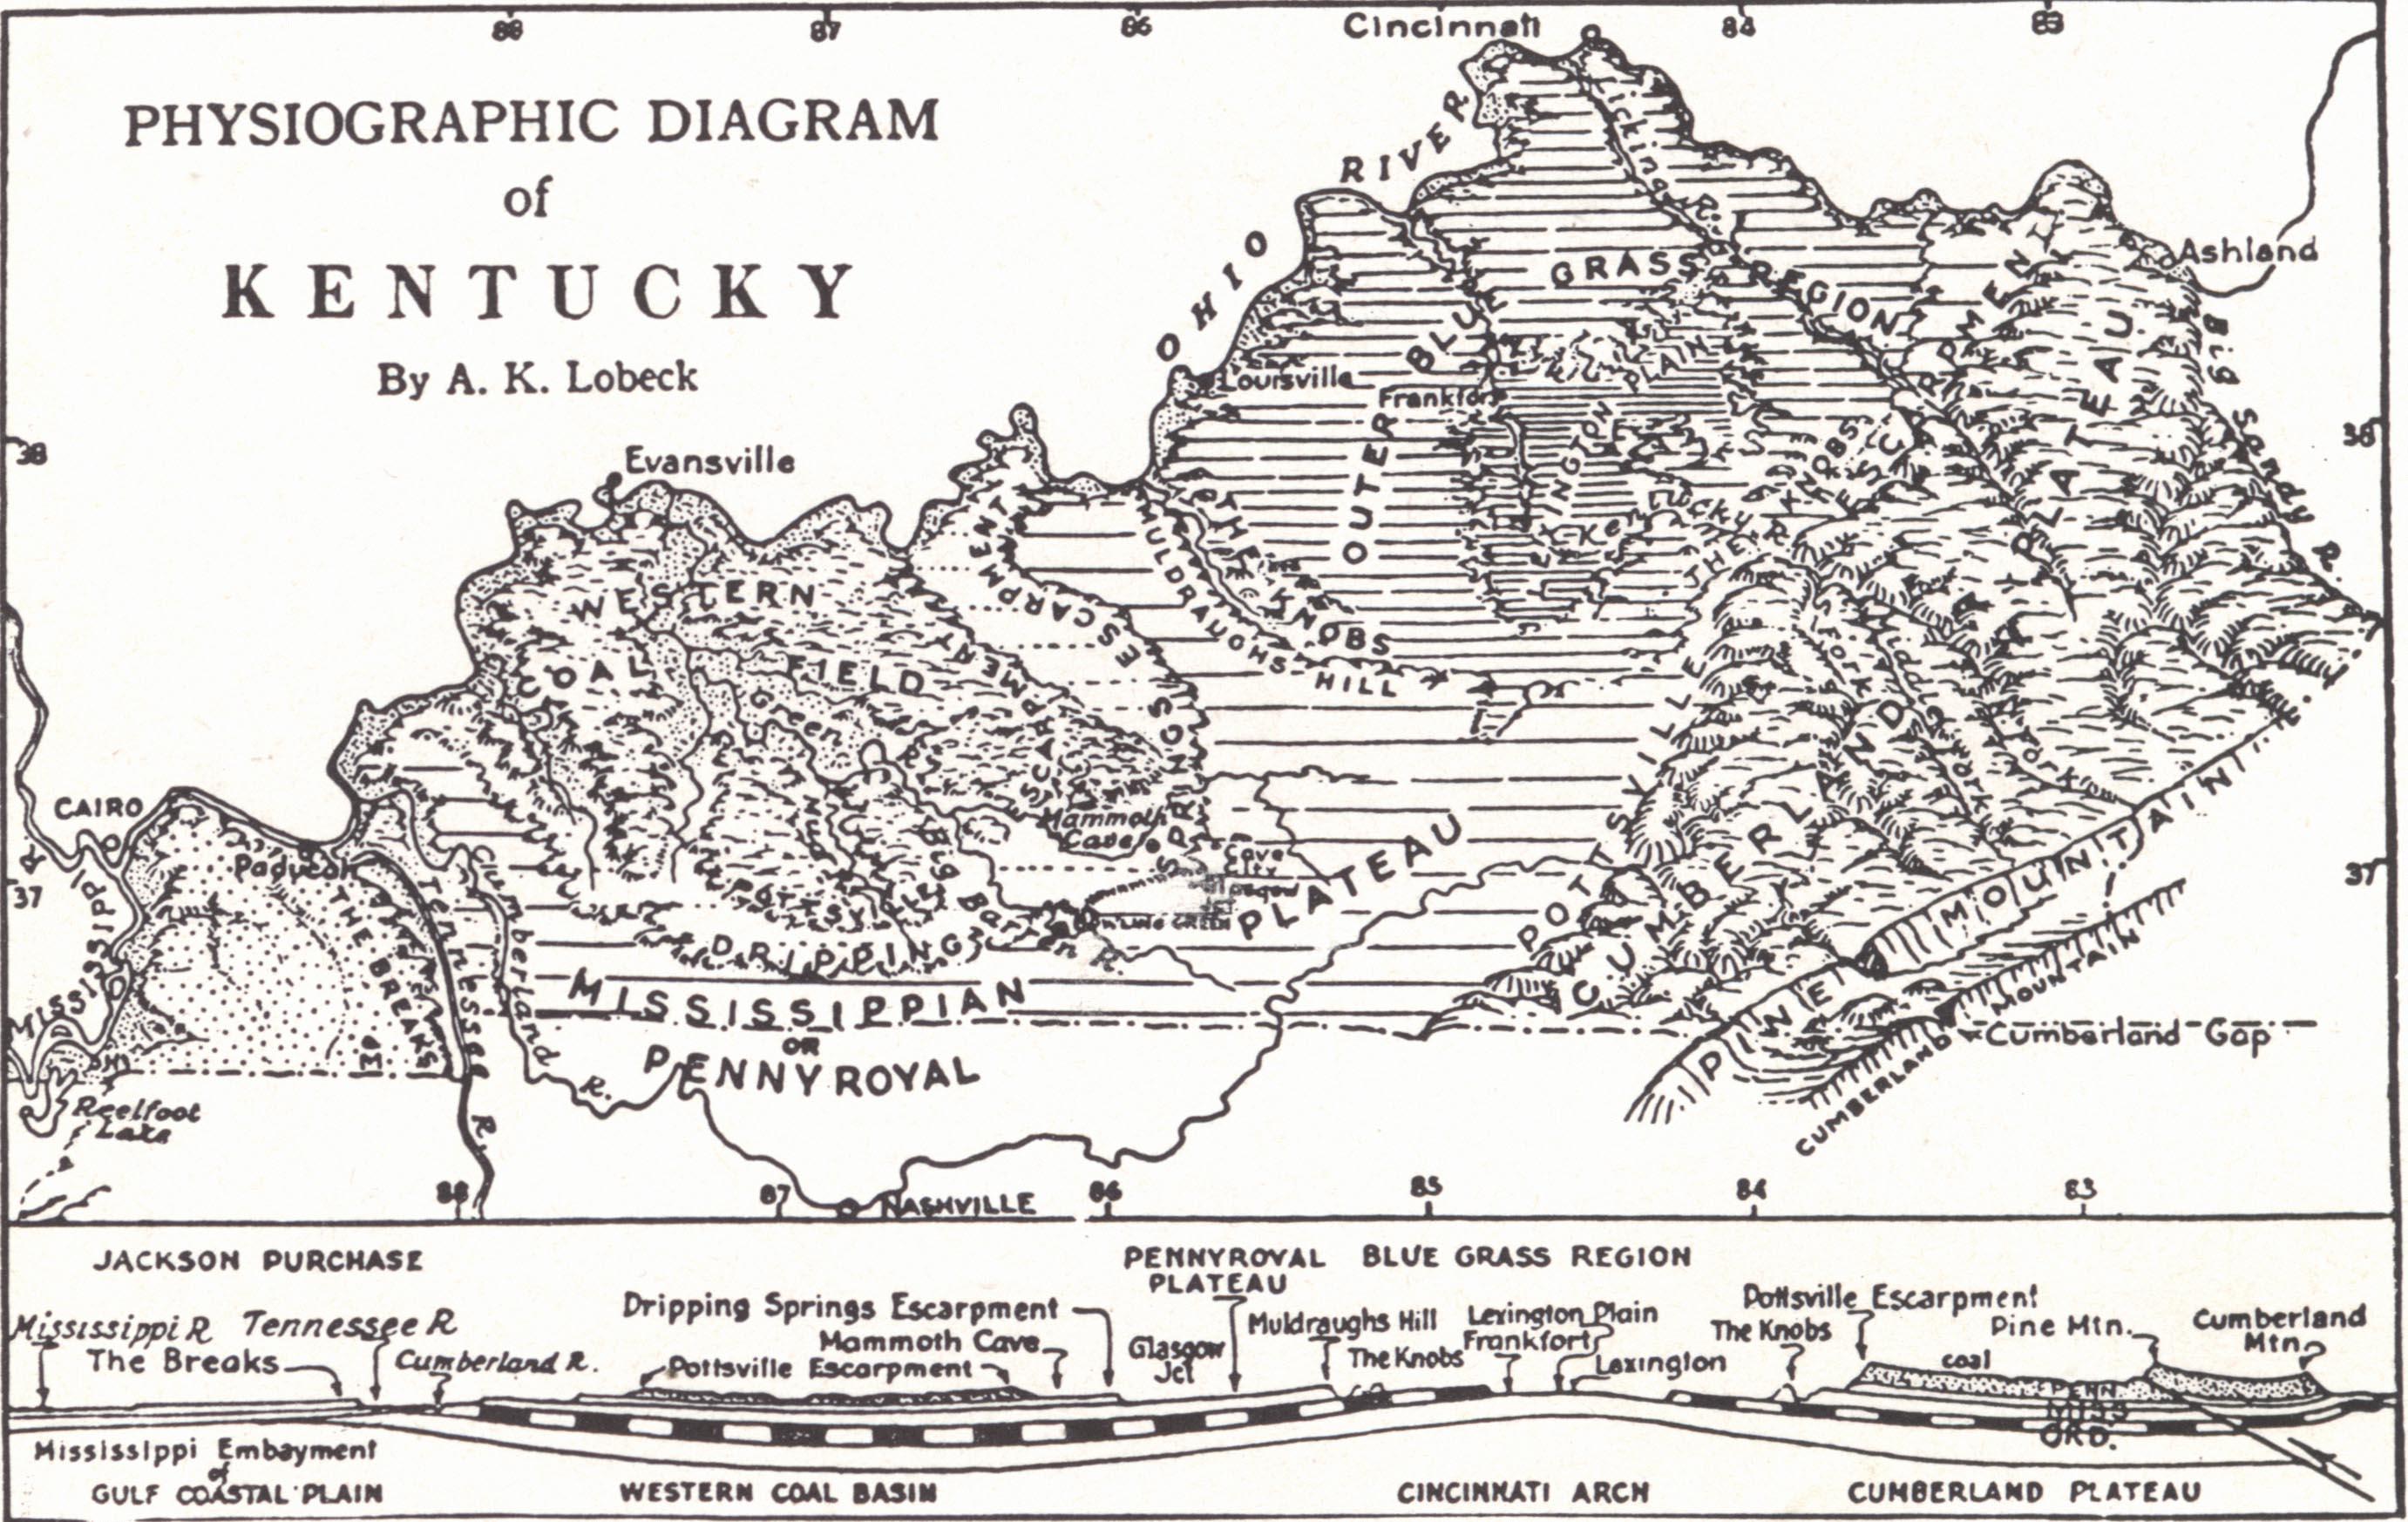 Topographical Map Of Kentucky Topographical Map Of Kentucky newark airport map Topographical Map Of Kentucky